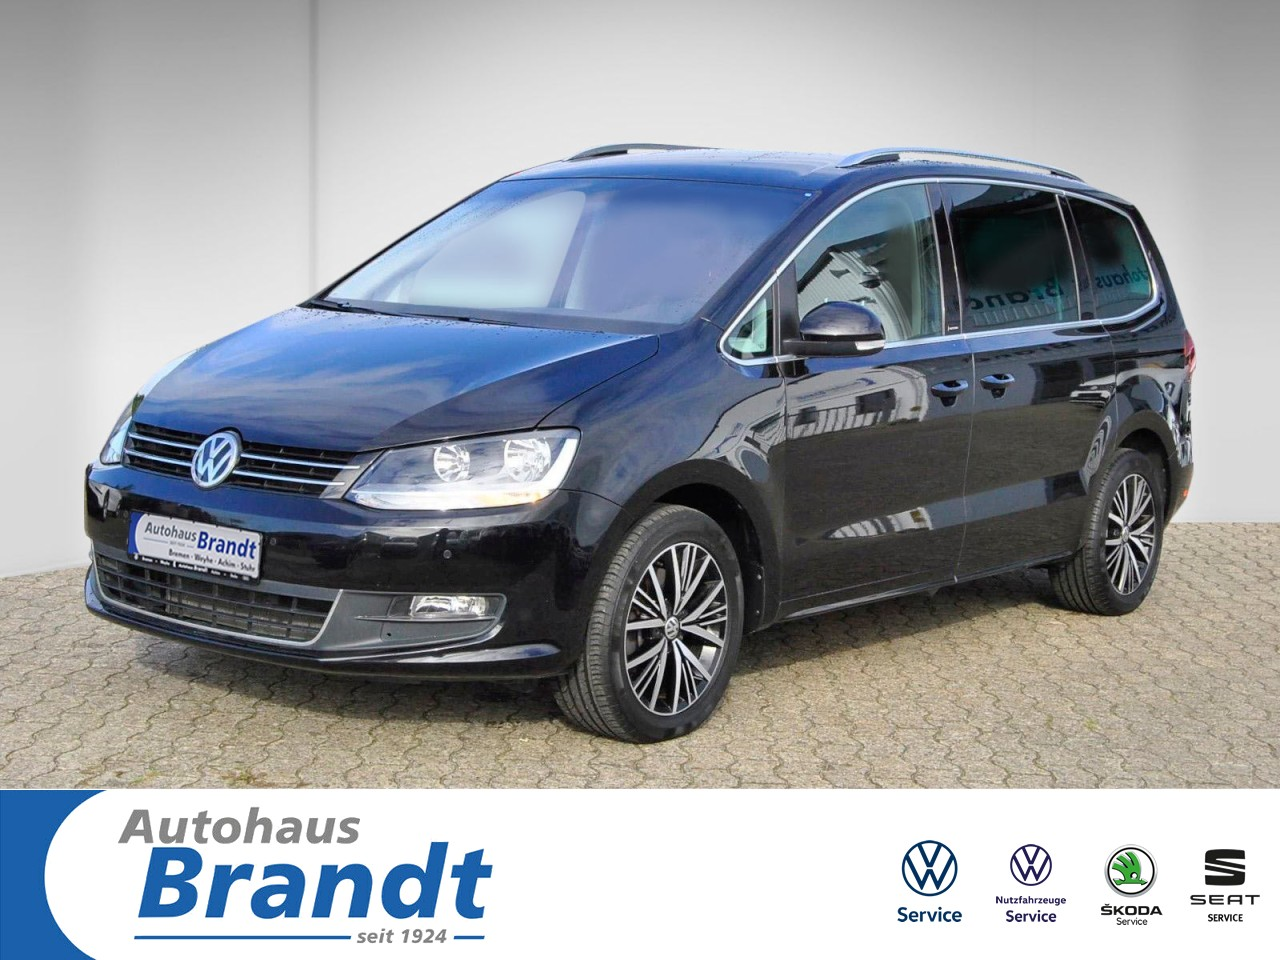 Volkswagen Sharan 2.0 TDI Allstar NAVI*ACC*4M Navi, Jahr 2016, Diesel